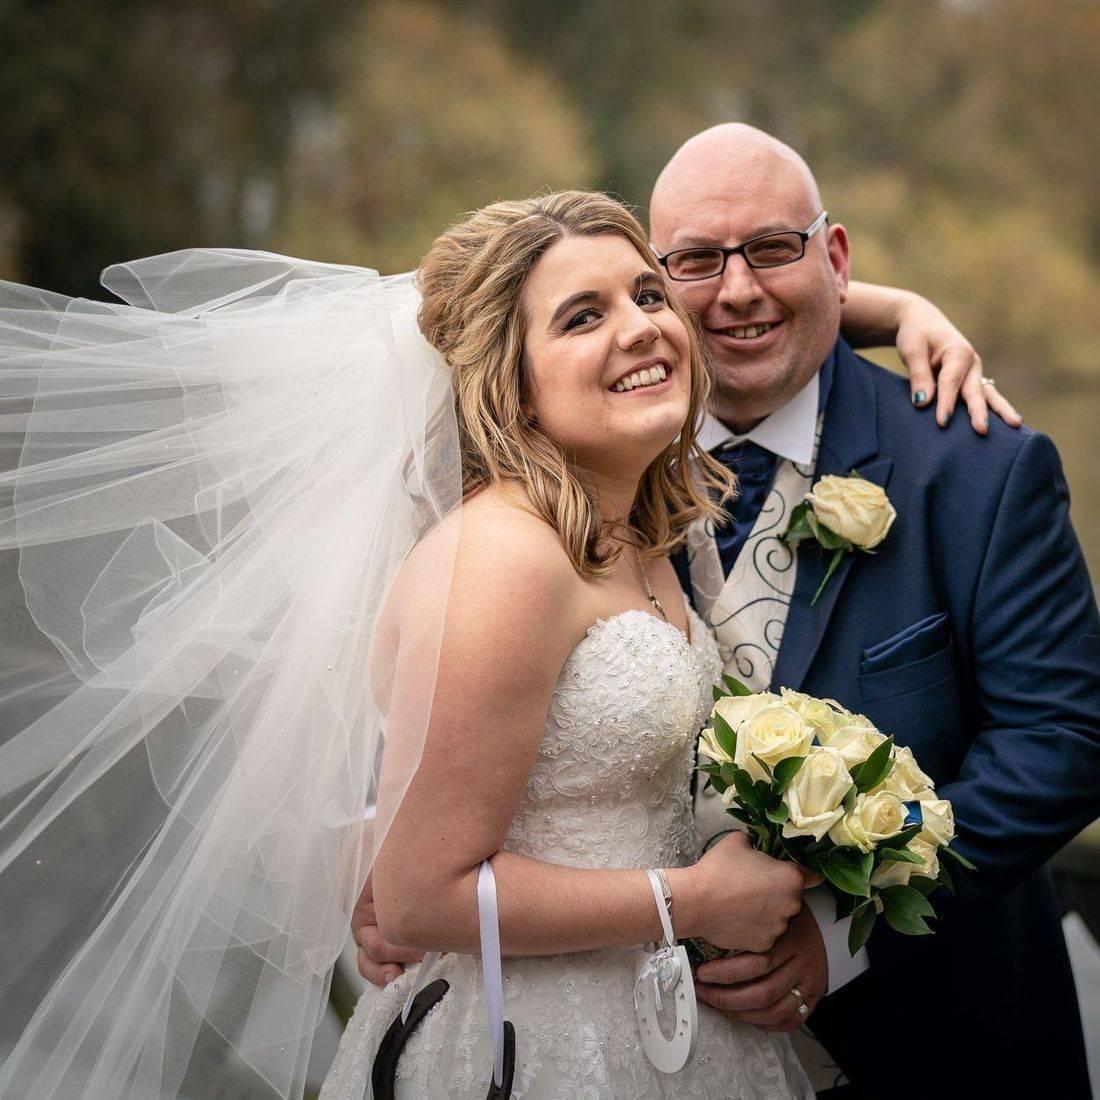 Lace Wedding dress, veil, happy wedding day